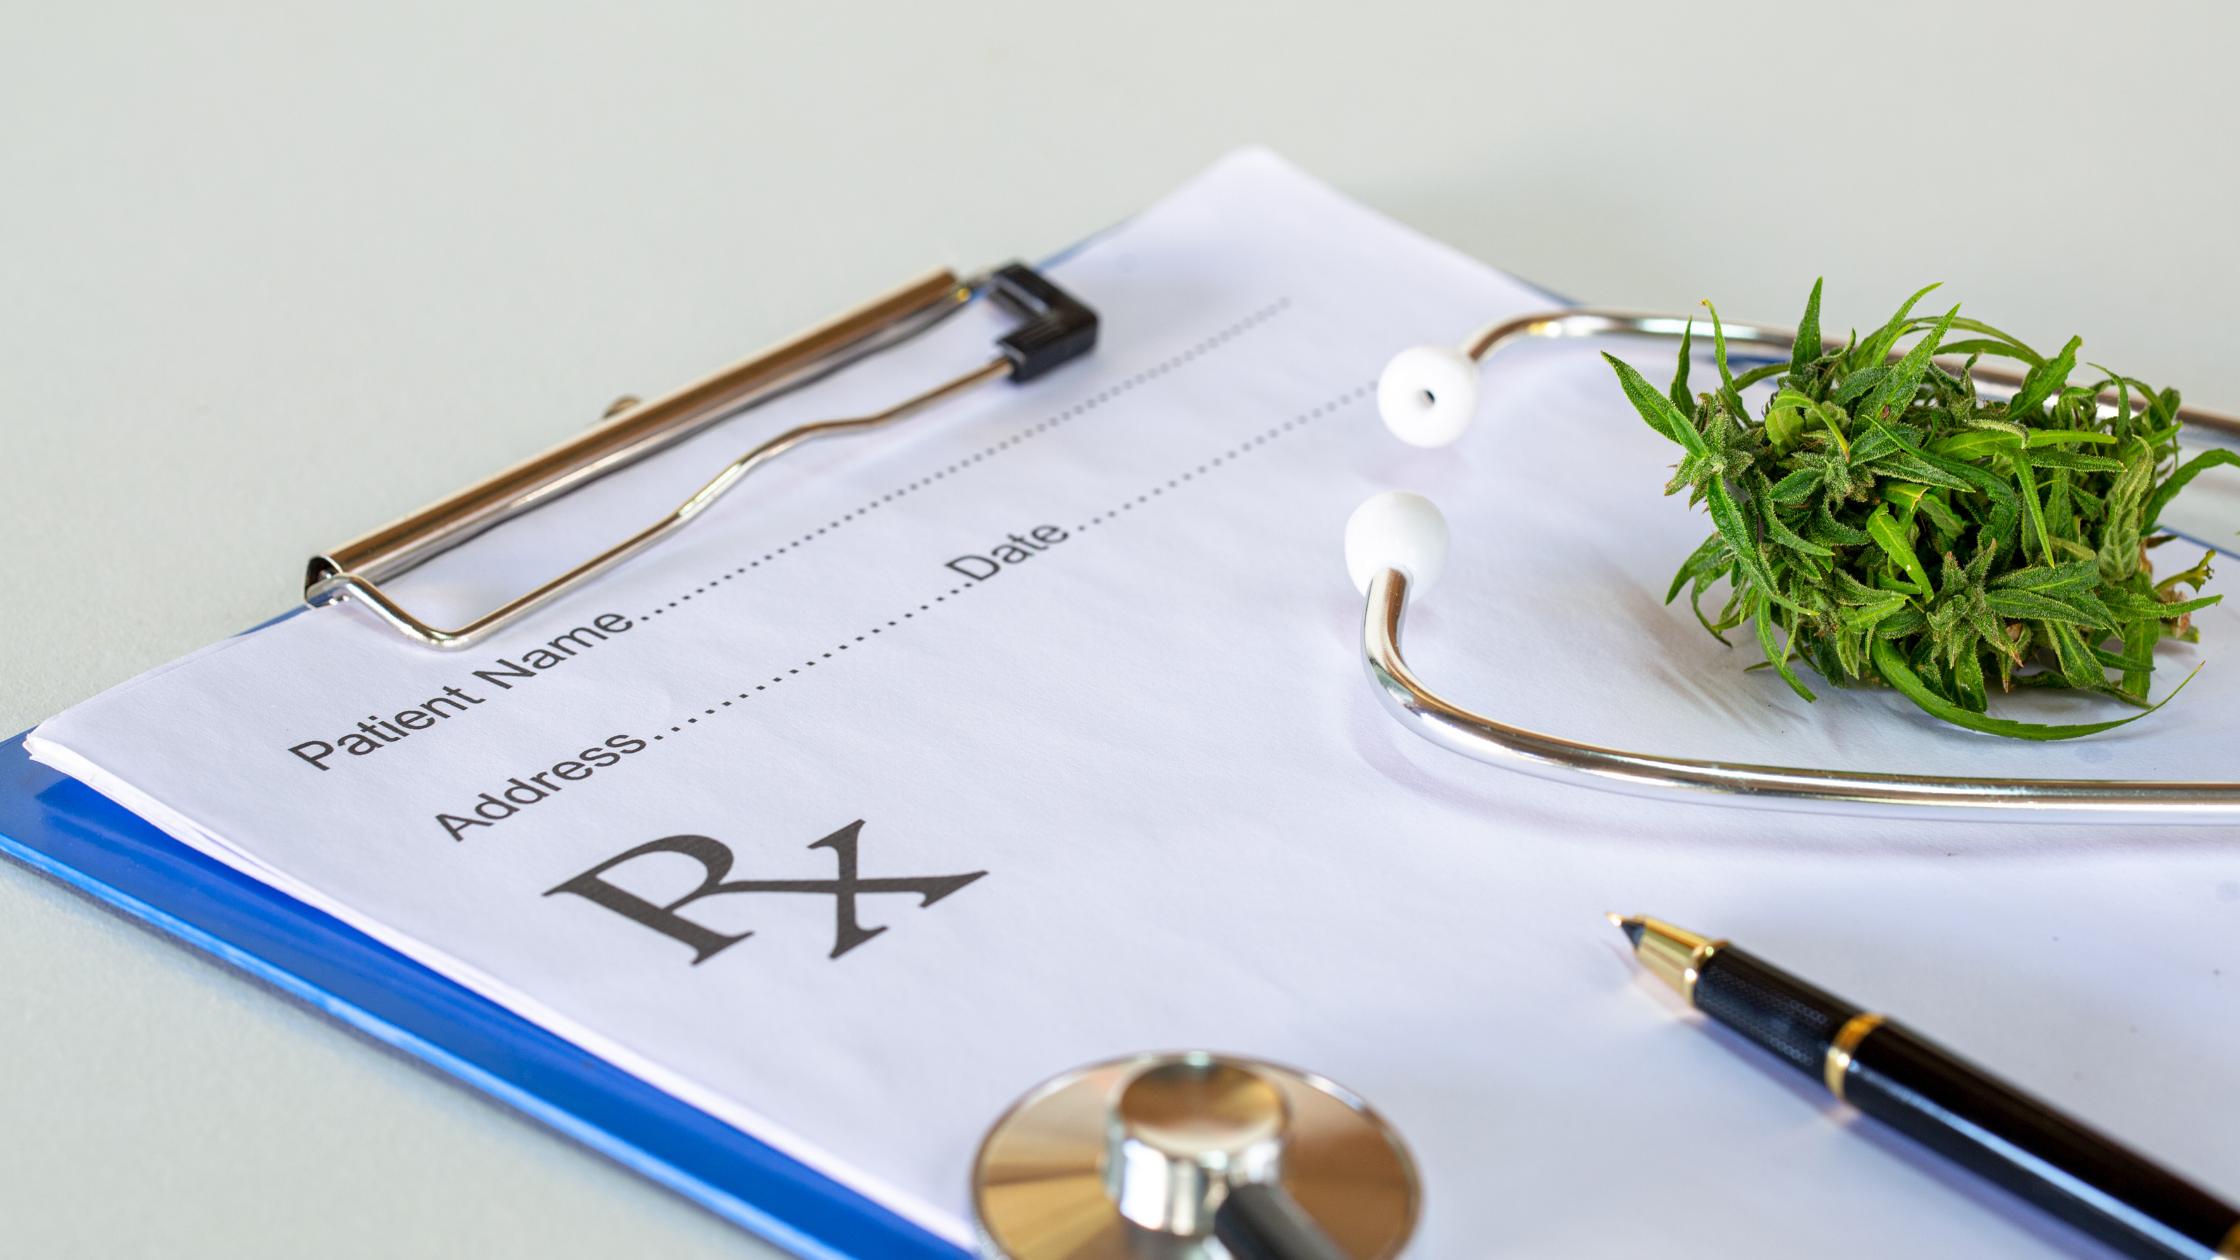 FDA regulations on medical marijuana